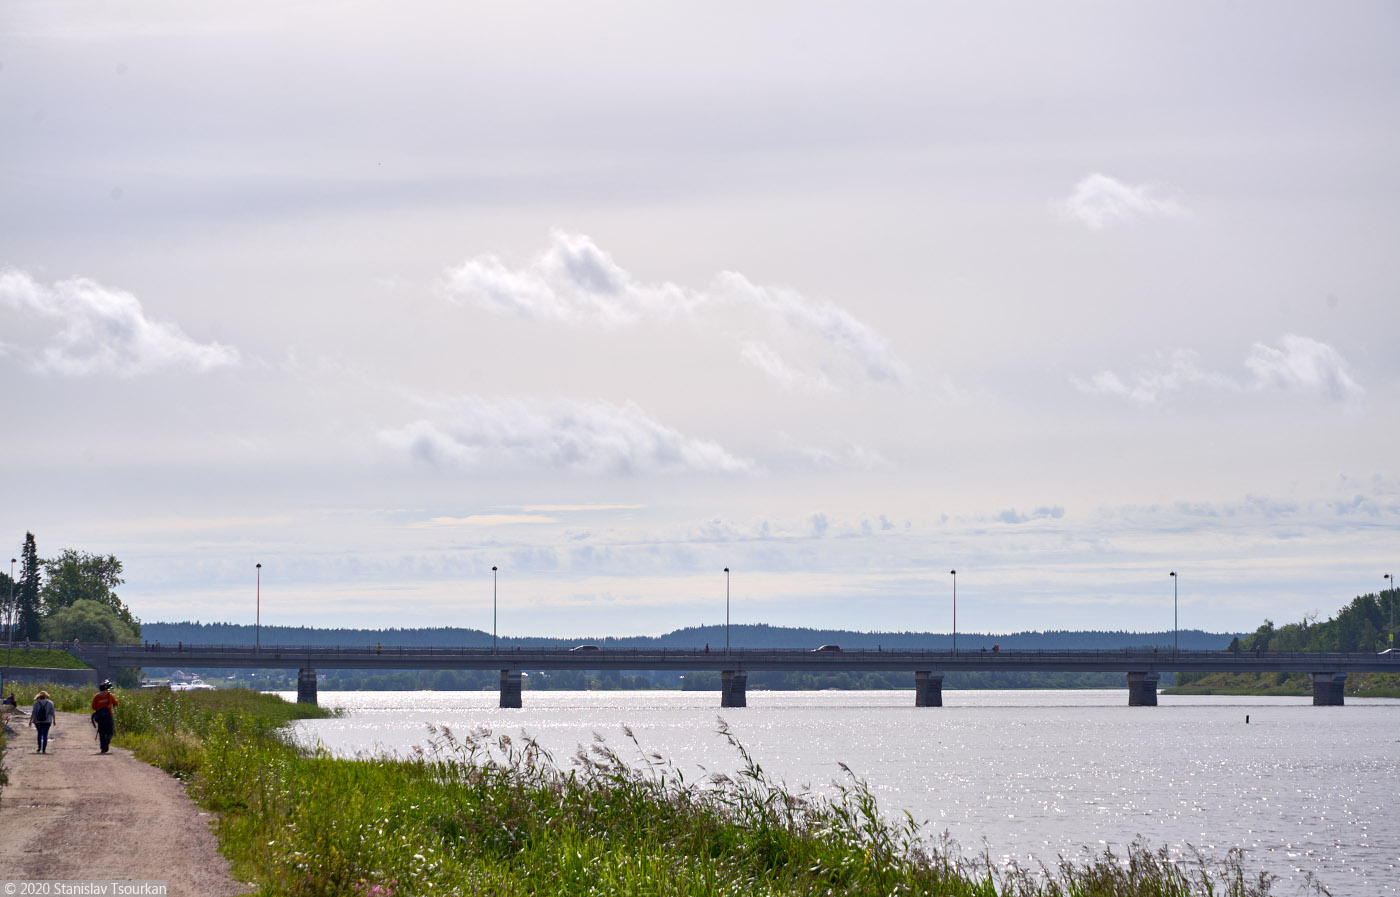 Карелия, республика Карелия, Сортавала, russia, karjala, sortavala, ляппяярви, карельский мост